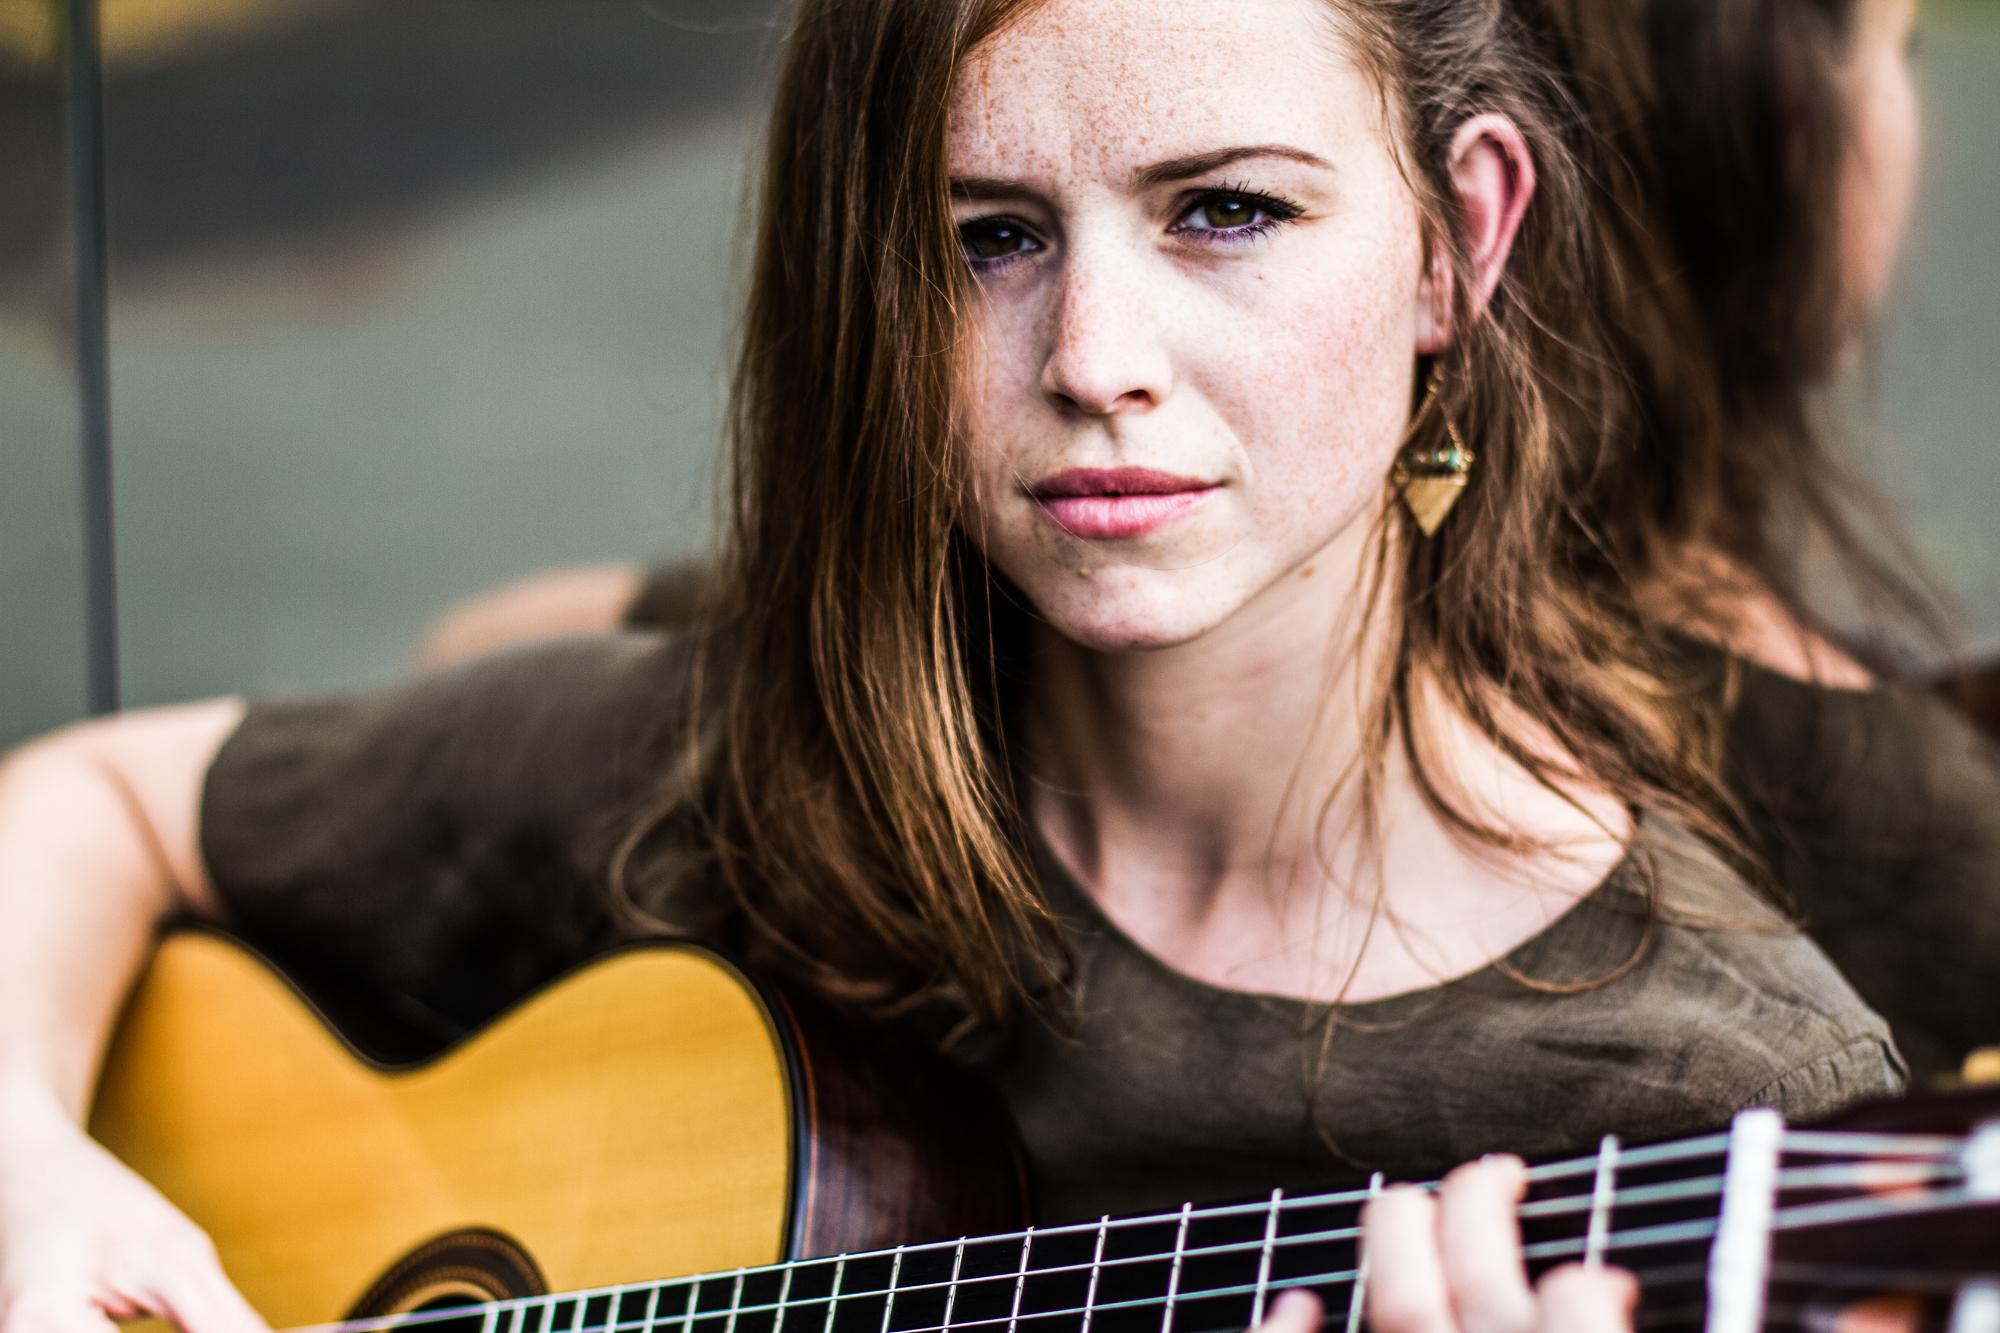 Jessica Kaiser playing guitar